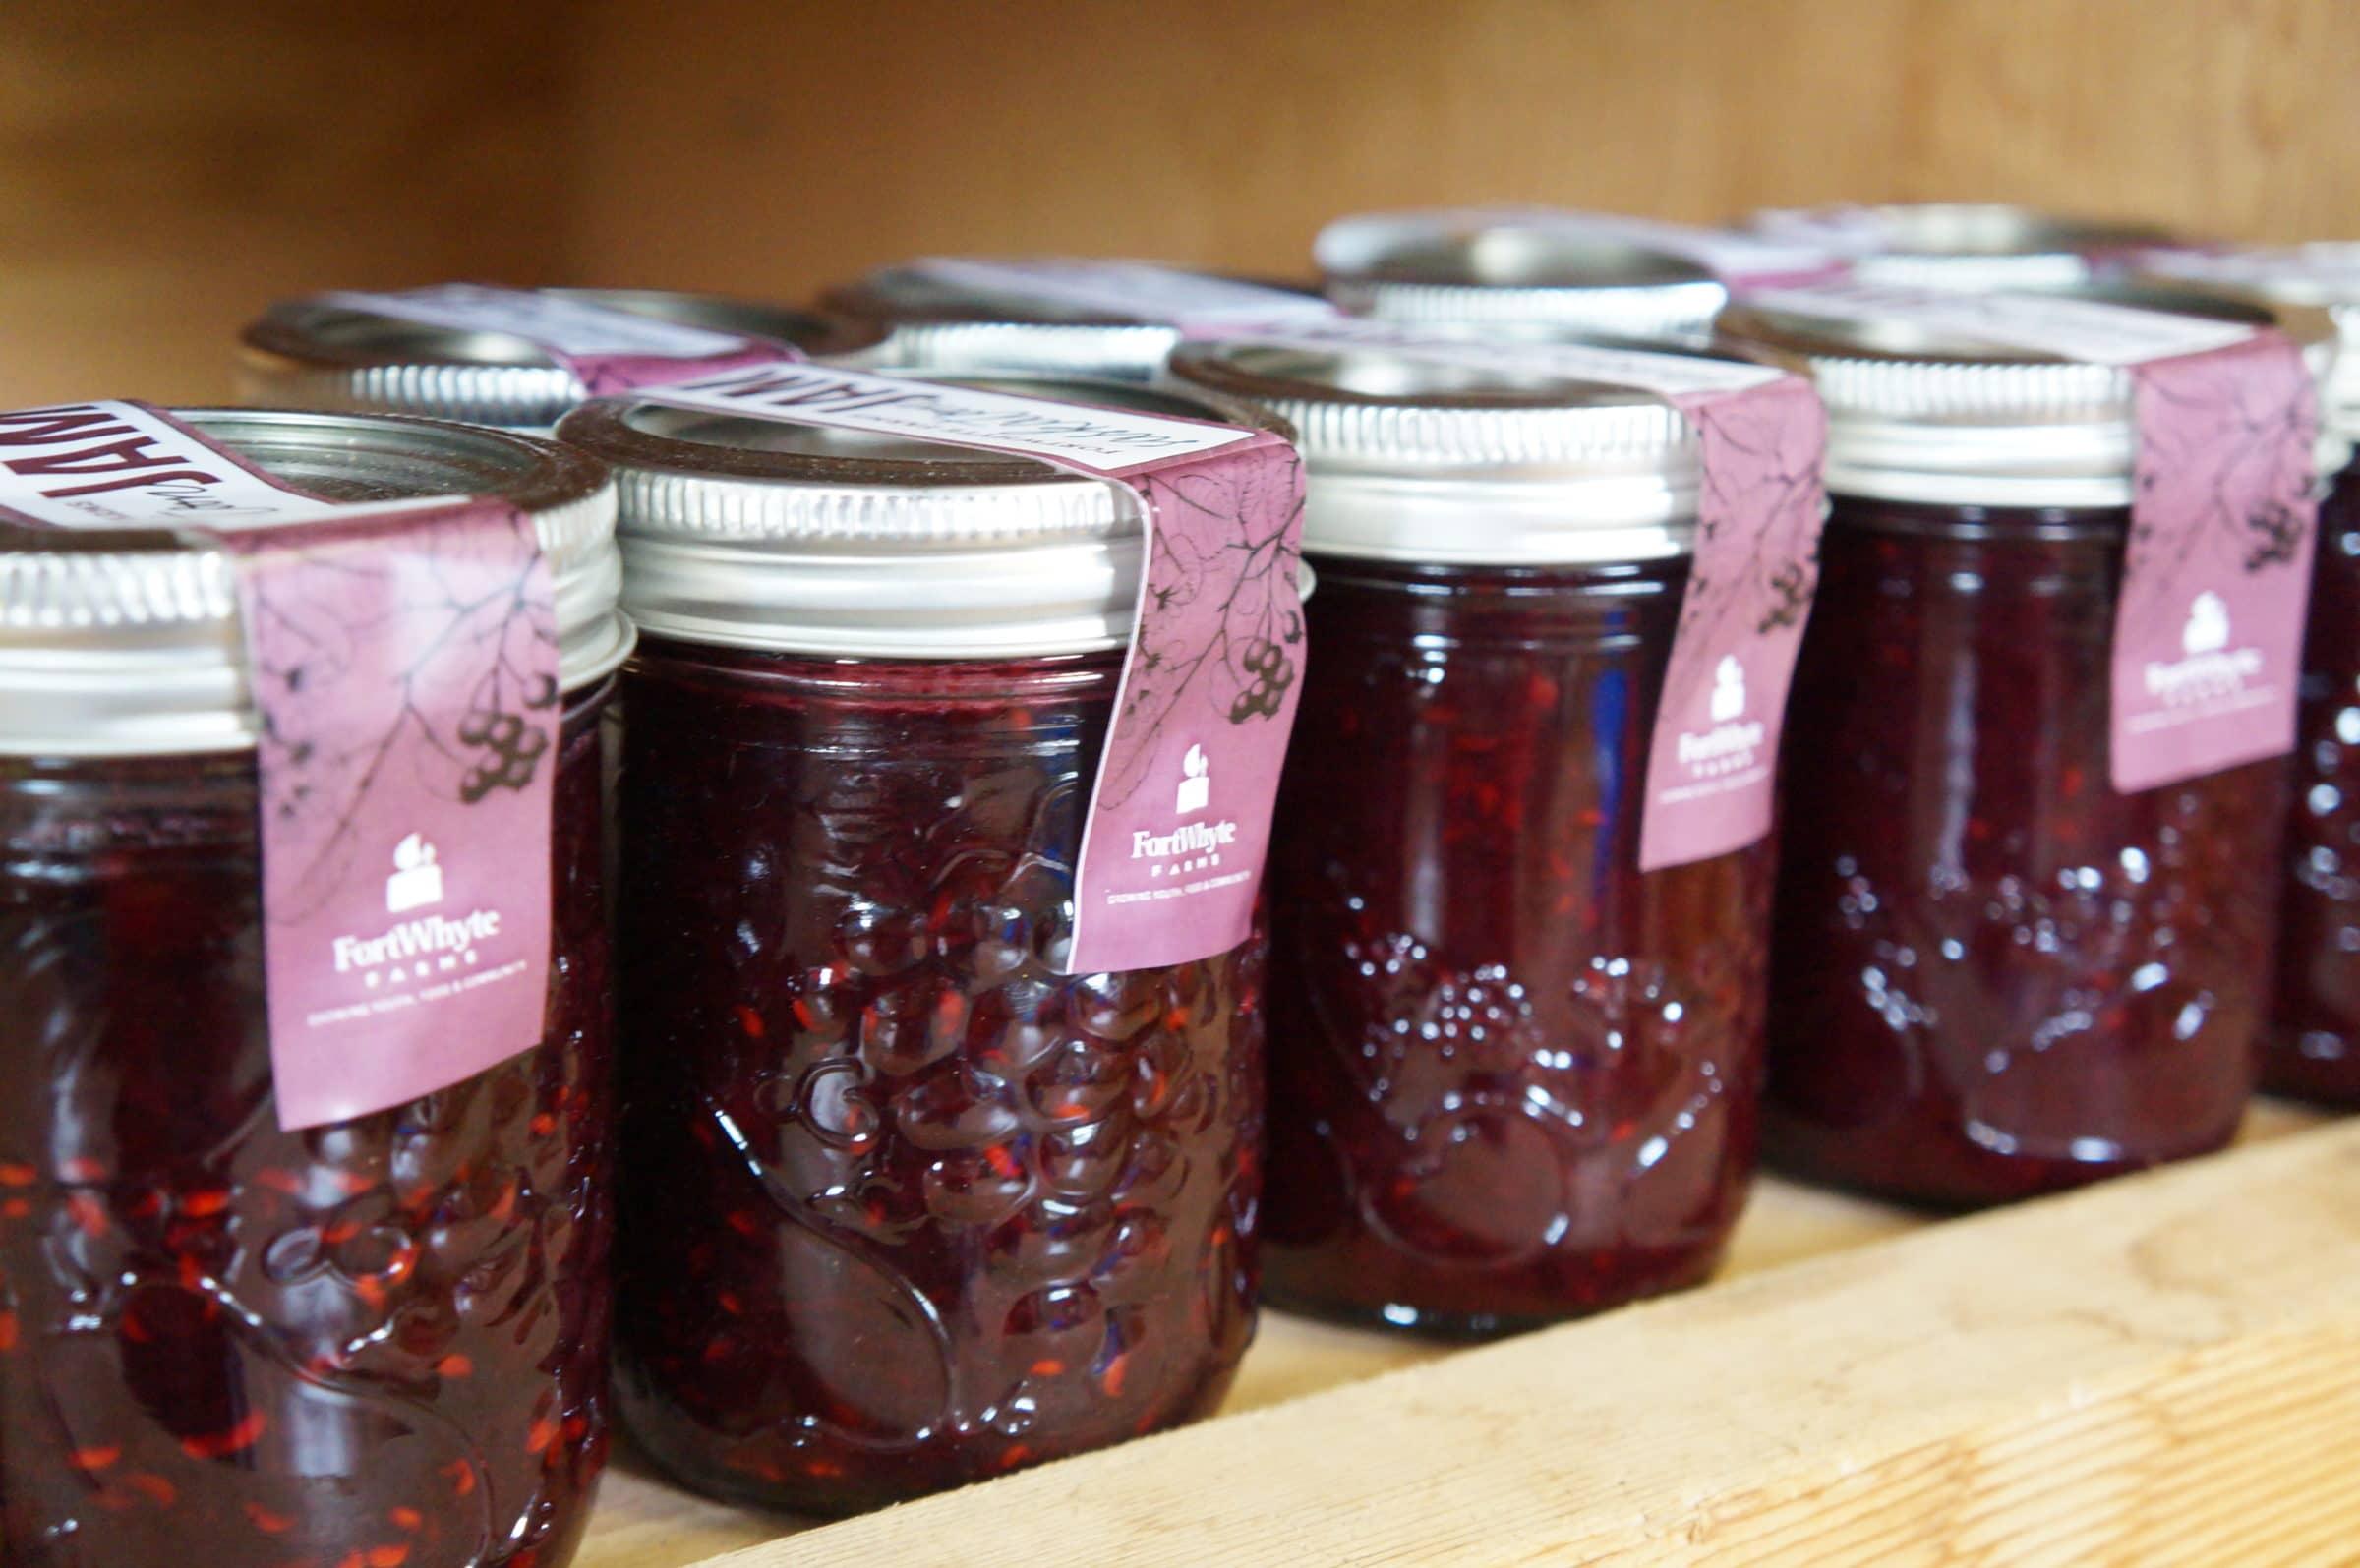 Jars of FortWhyte Farms berry jam on a shelf